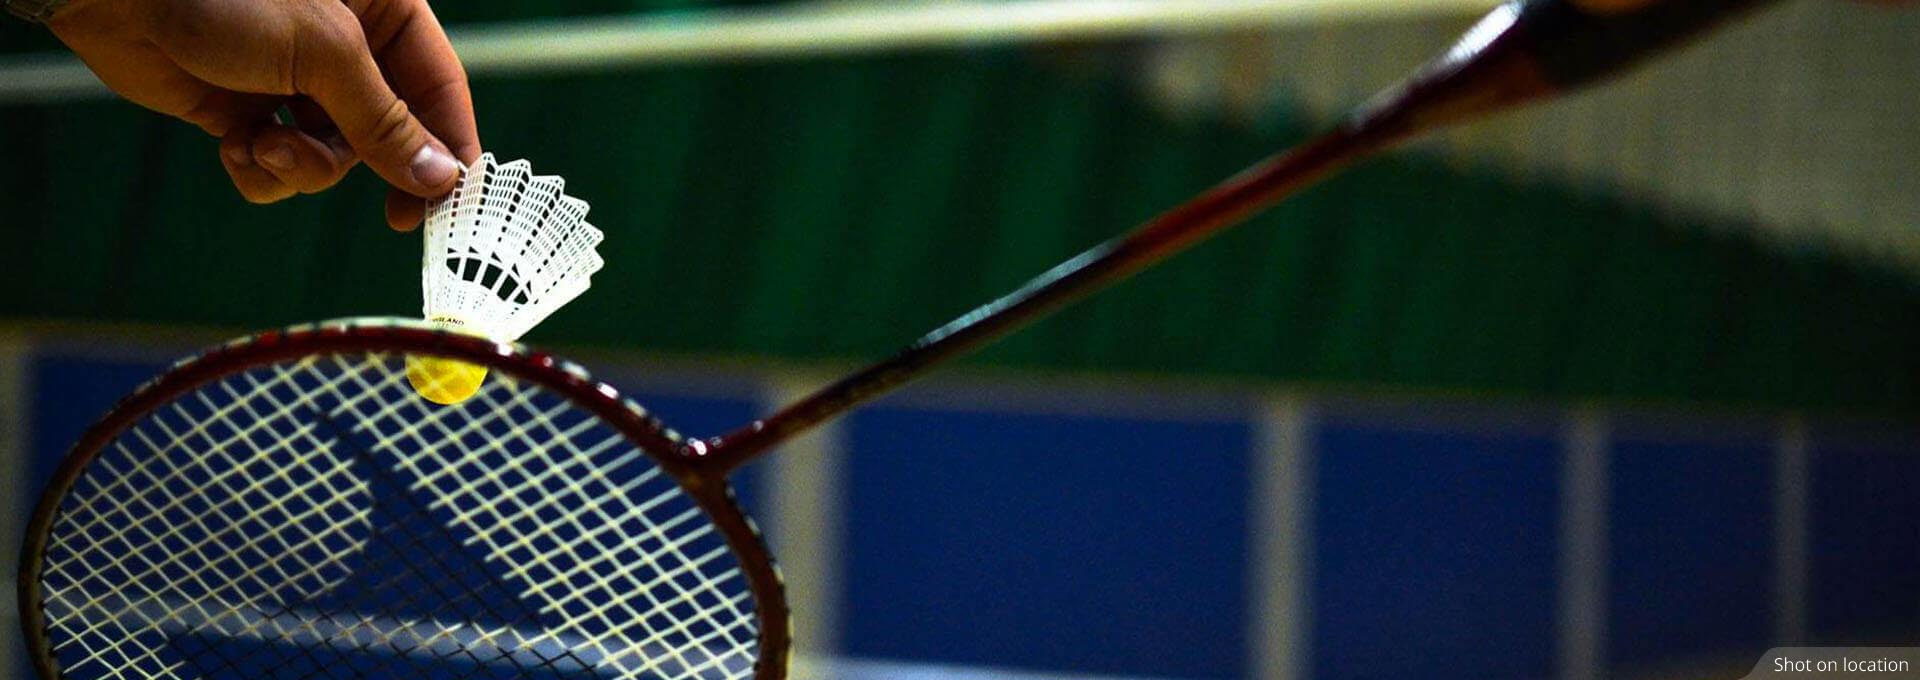 Badminton Court near Villas by House of Hiranandani in Devanahalli, Bengaluru